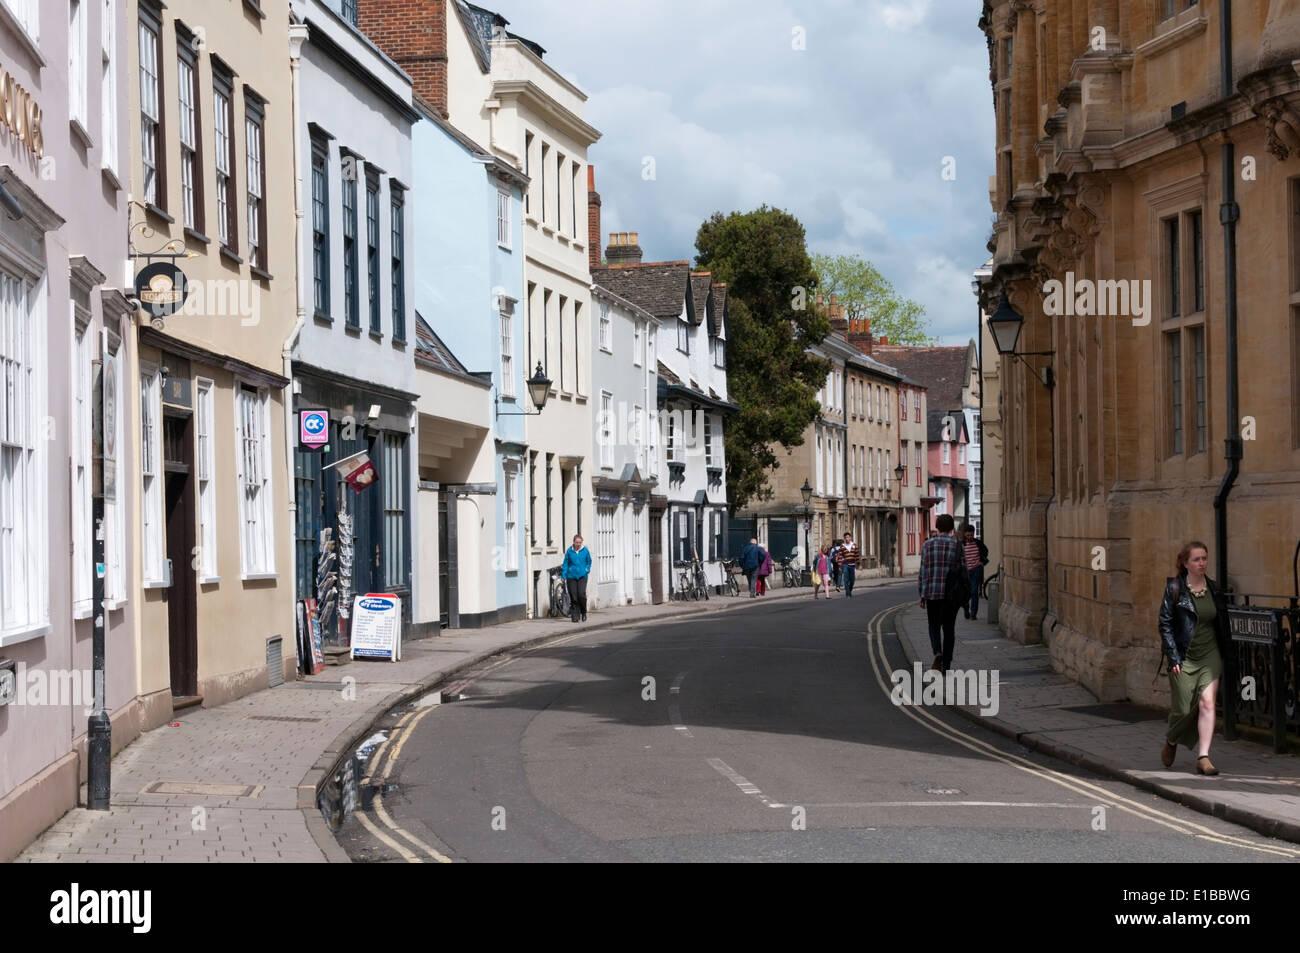 thesis binding holywell street oxford